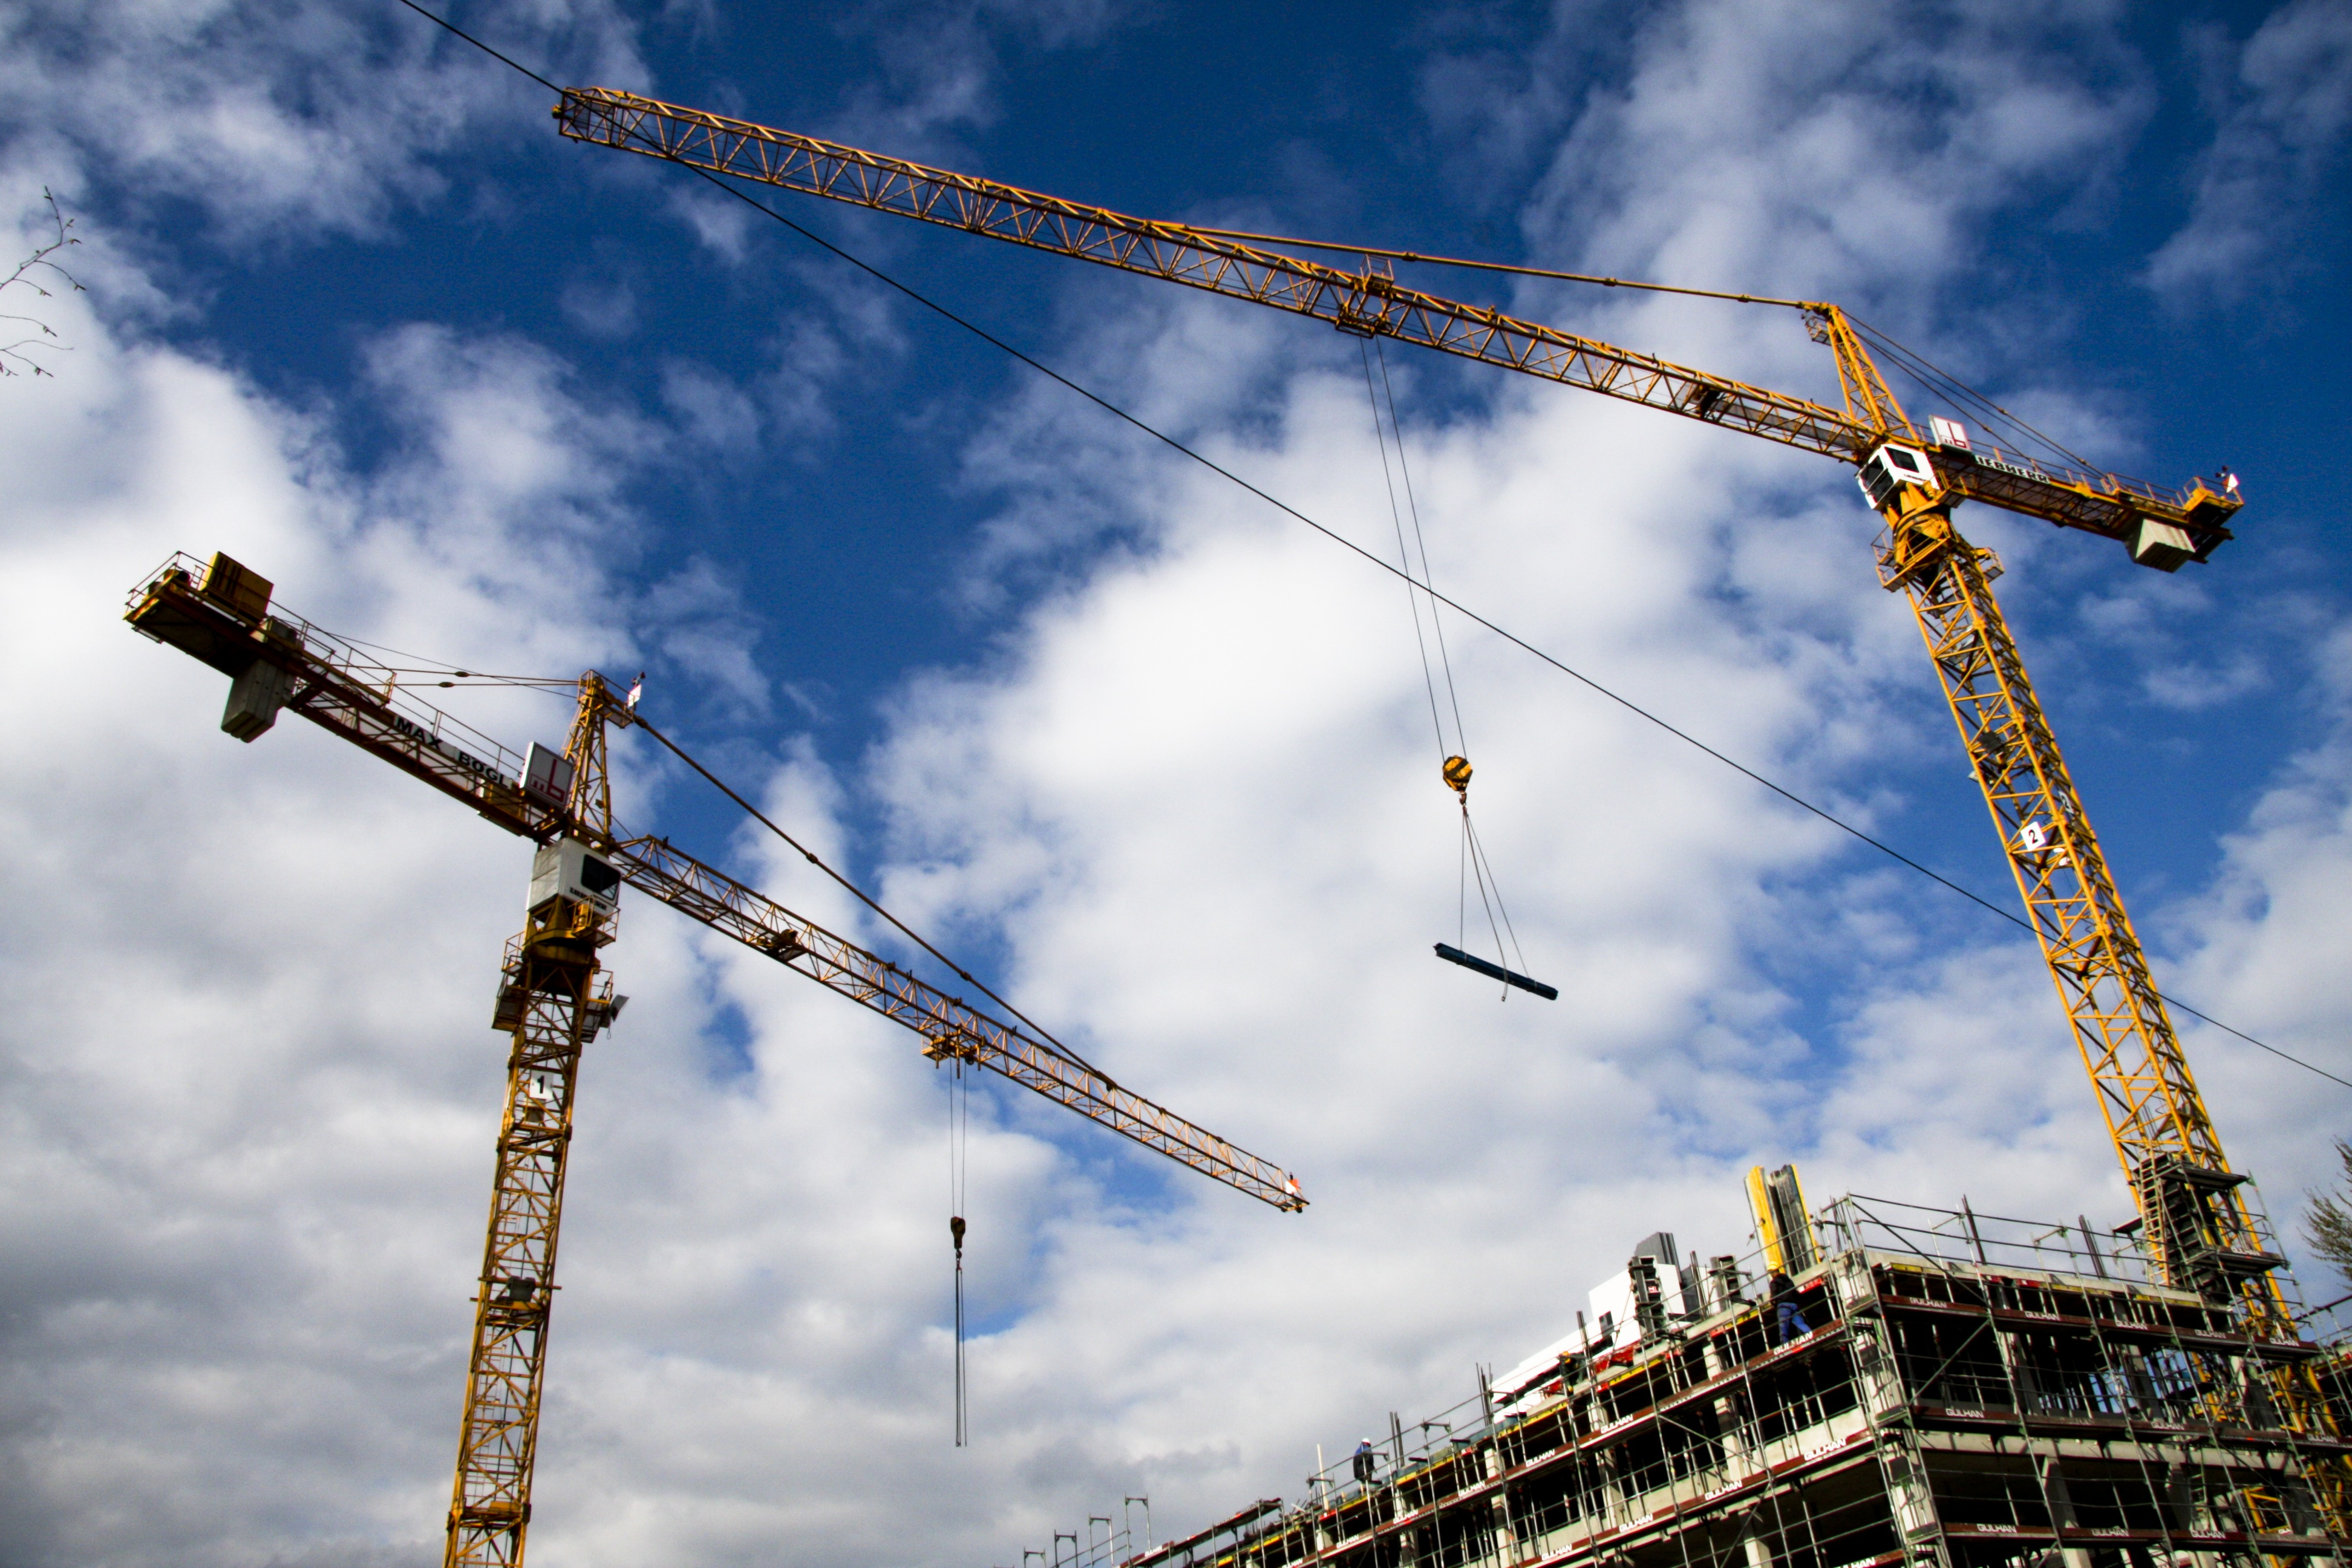 Na construção civil